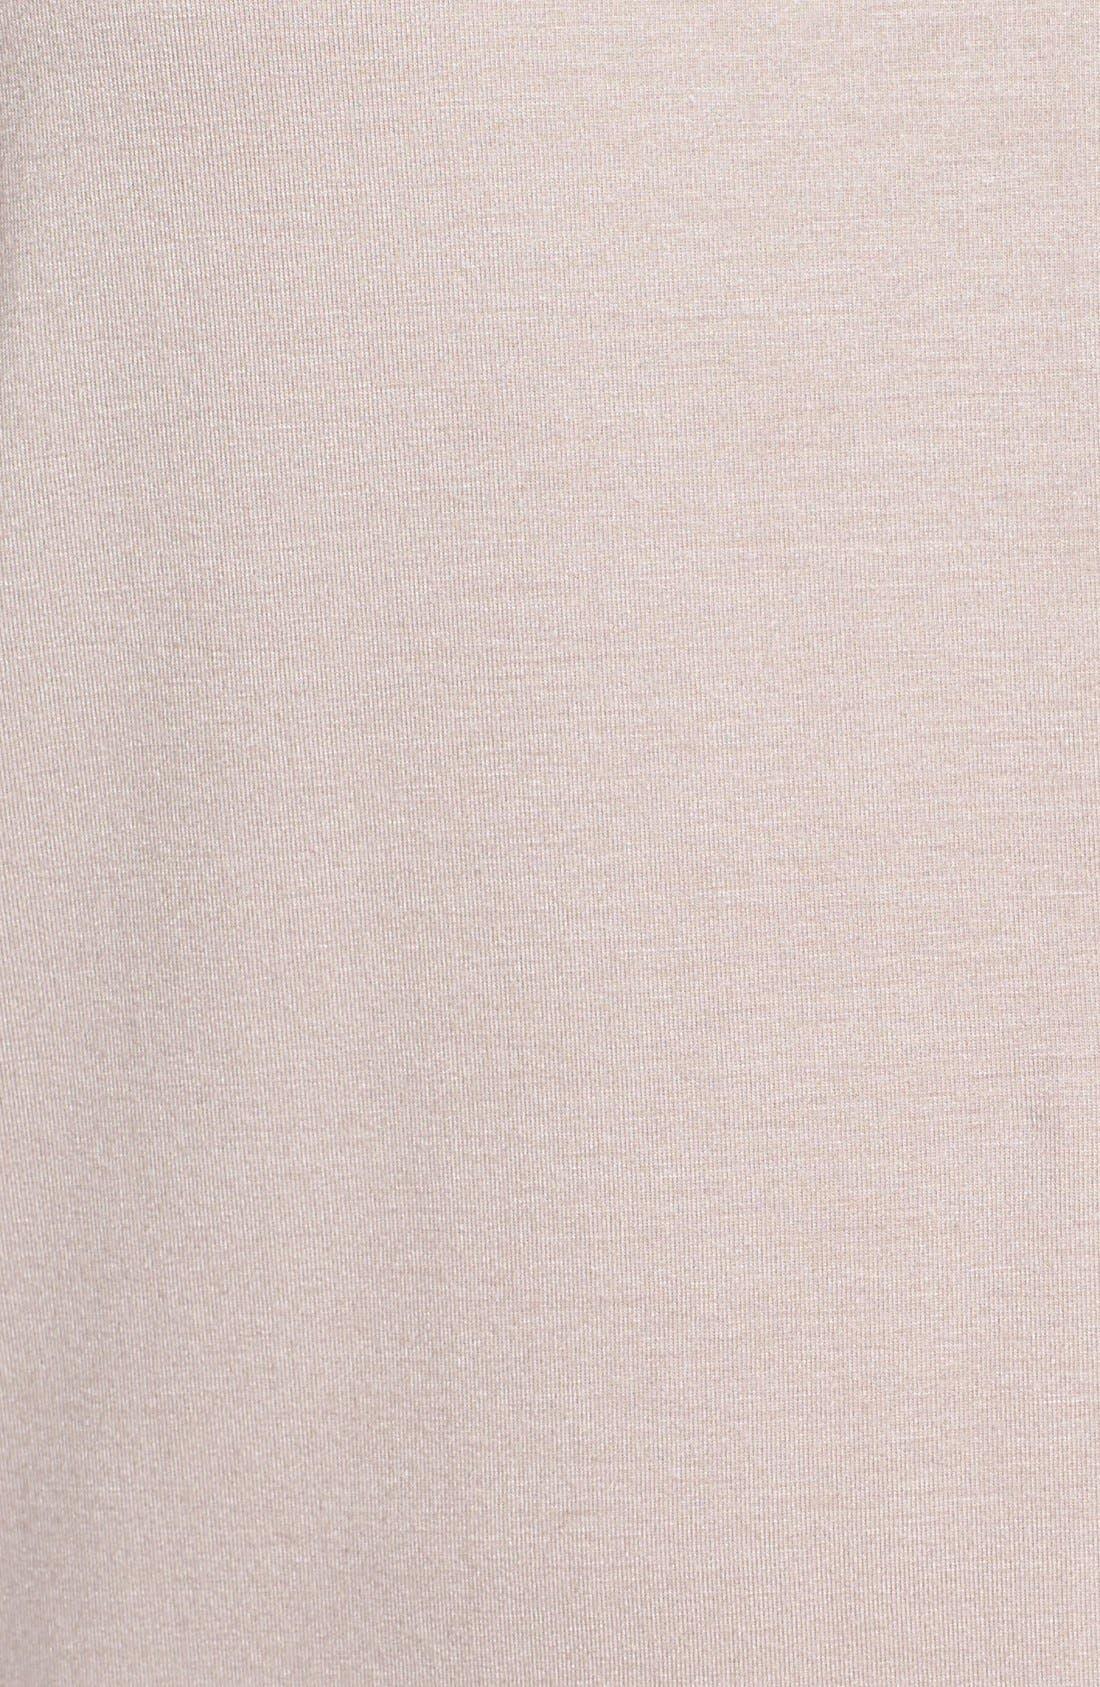 Alternate Image 3  - Midnight by Carole Hochman 'Magic Moment' Pajamas (Plus Size)